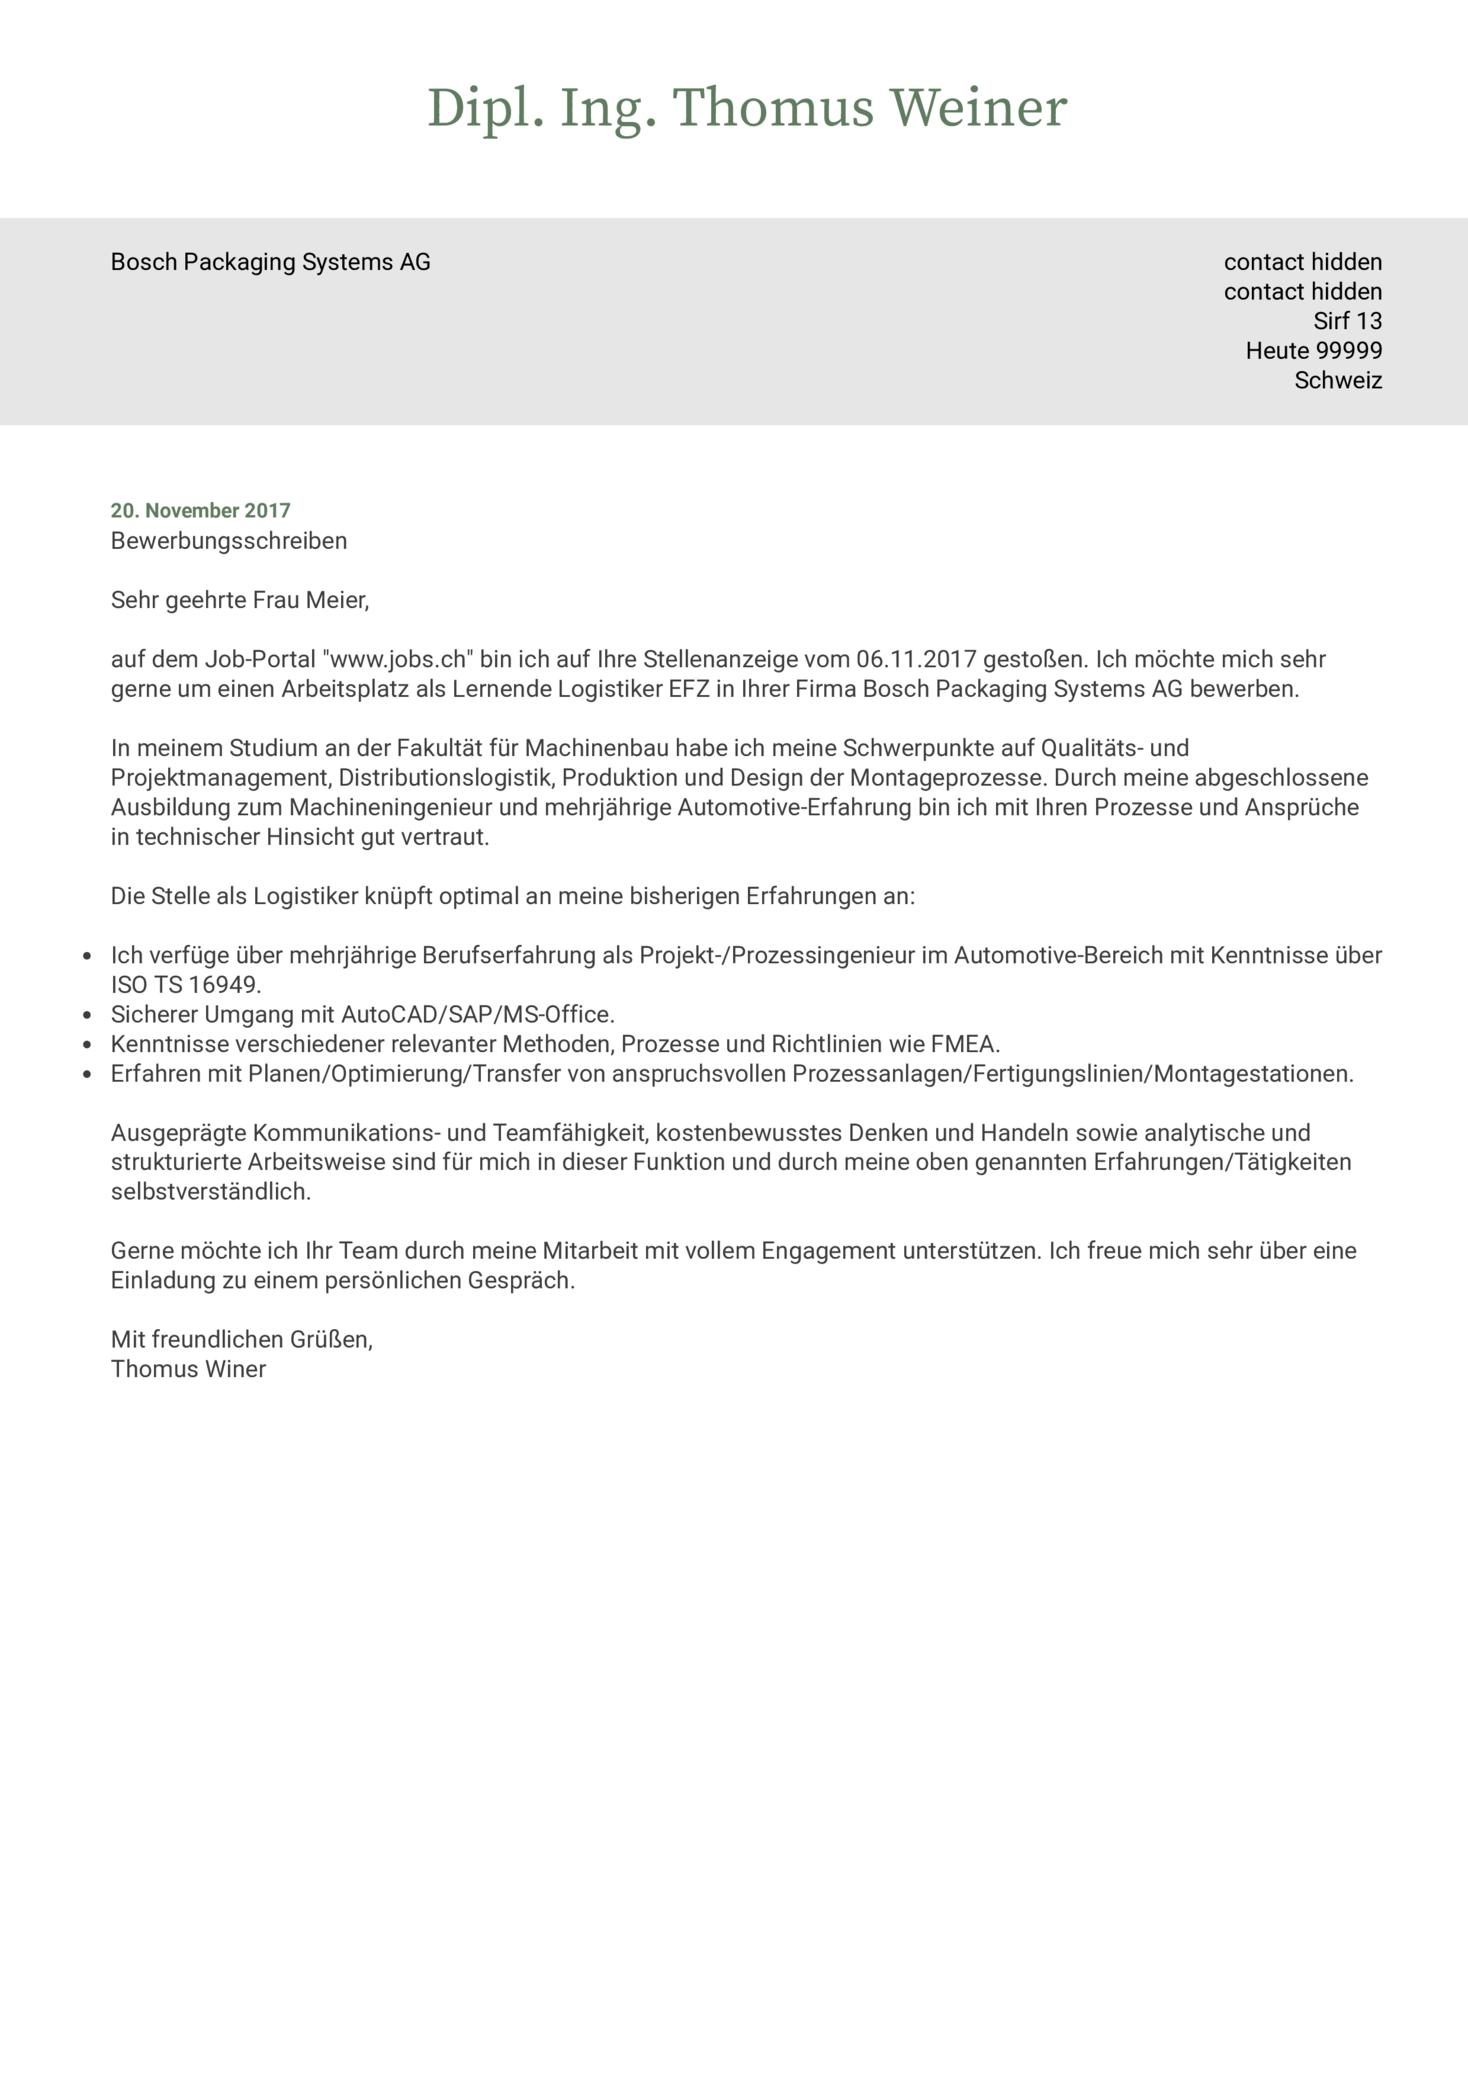 Bosch Maschinenbauingenieur Lebenslauf Sample [DE]